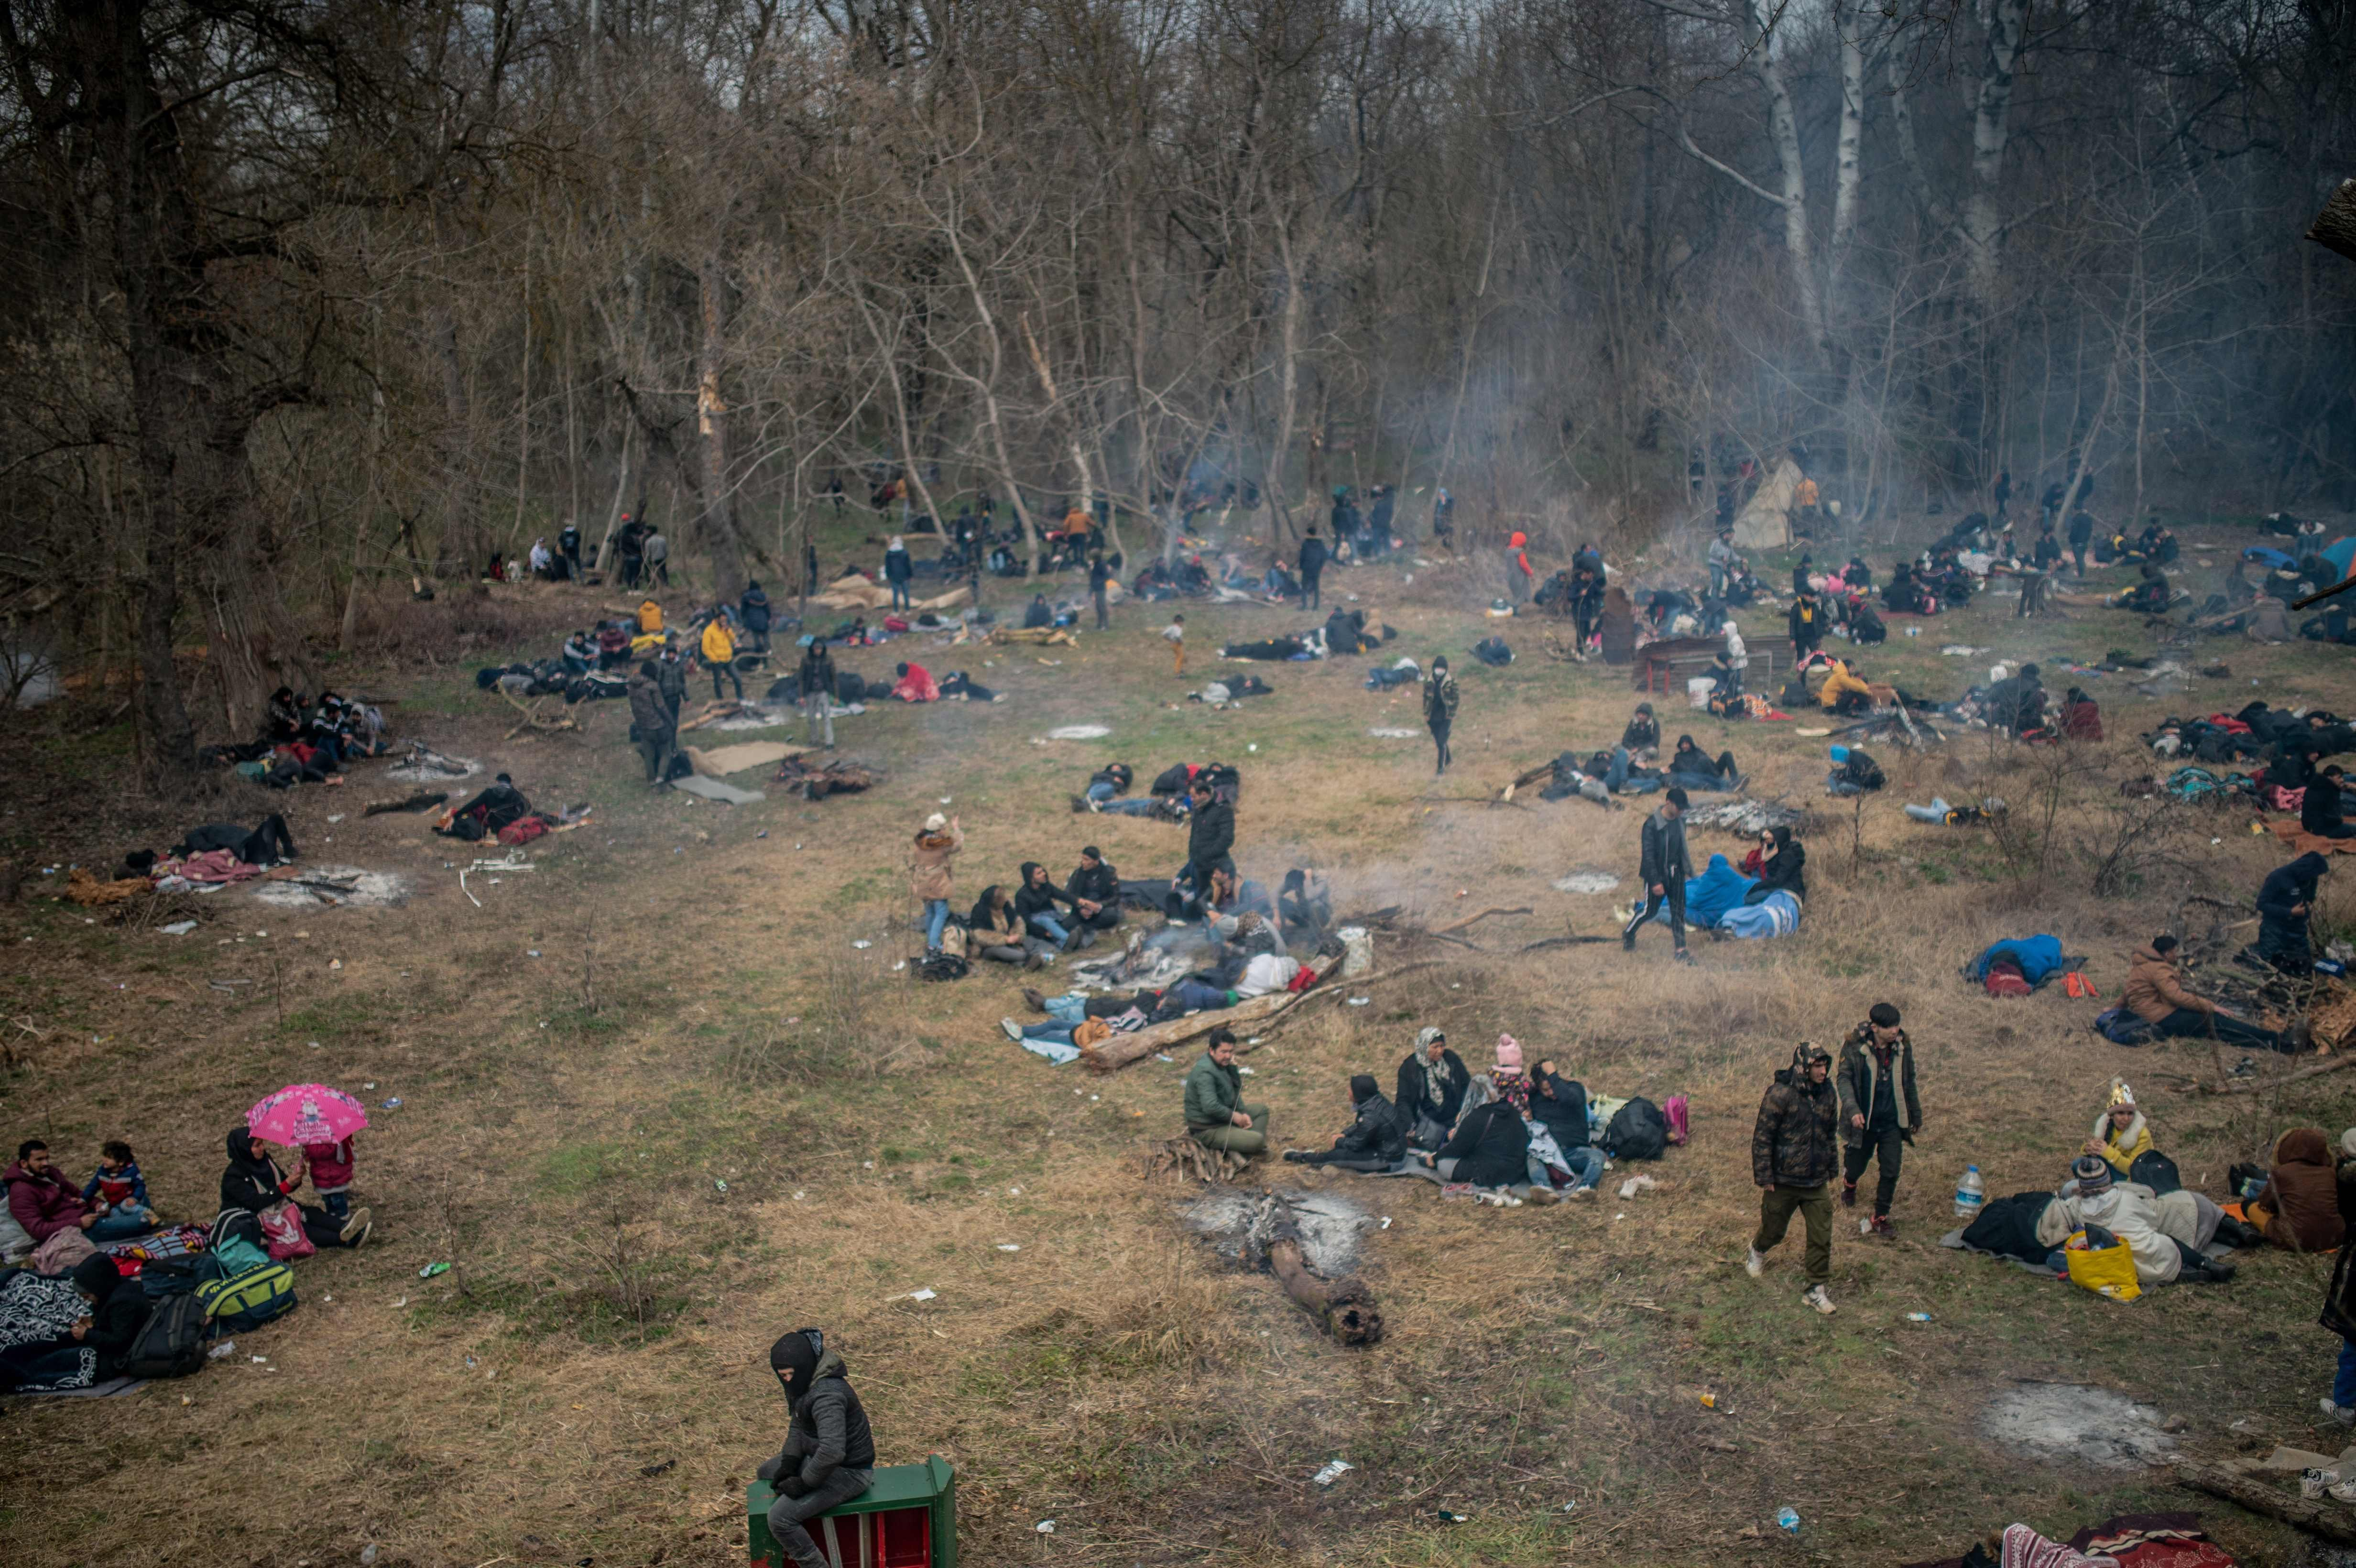 Migrants wait in a field near the buffer zone at Turkey-Greece border, at Pazarkule, in Edirne district, Feb. 29, 2020. (AFP)